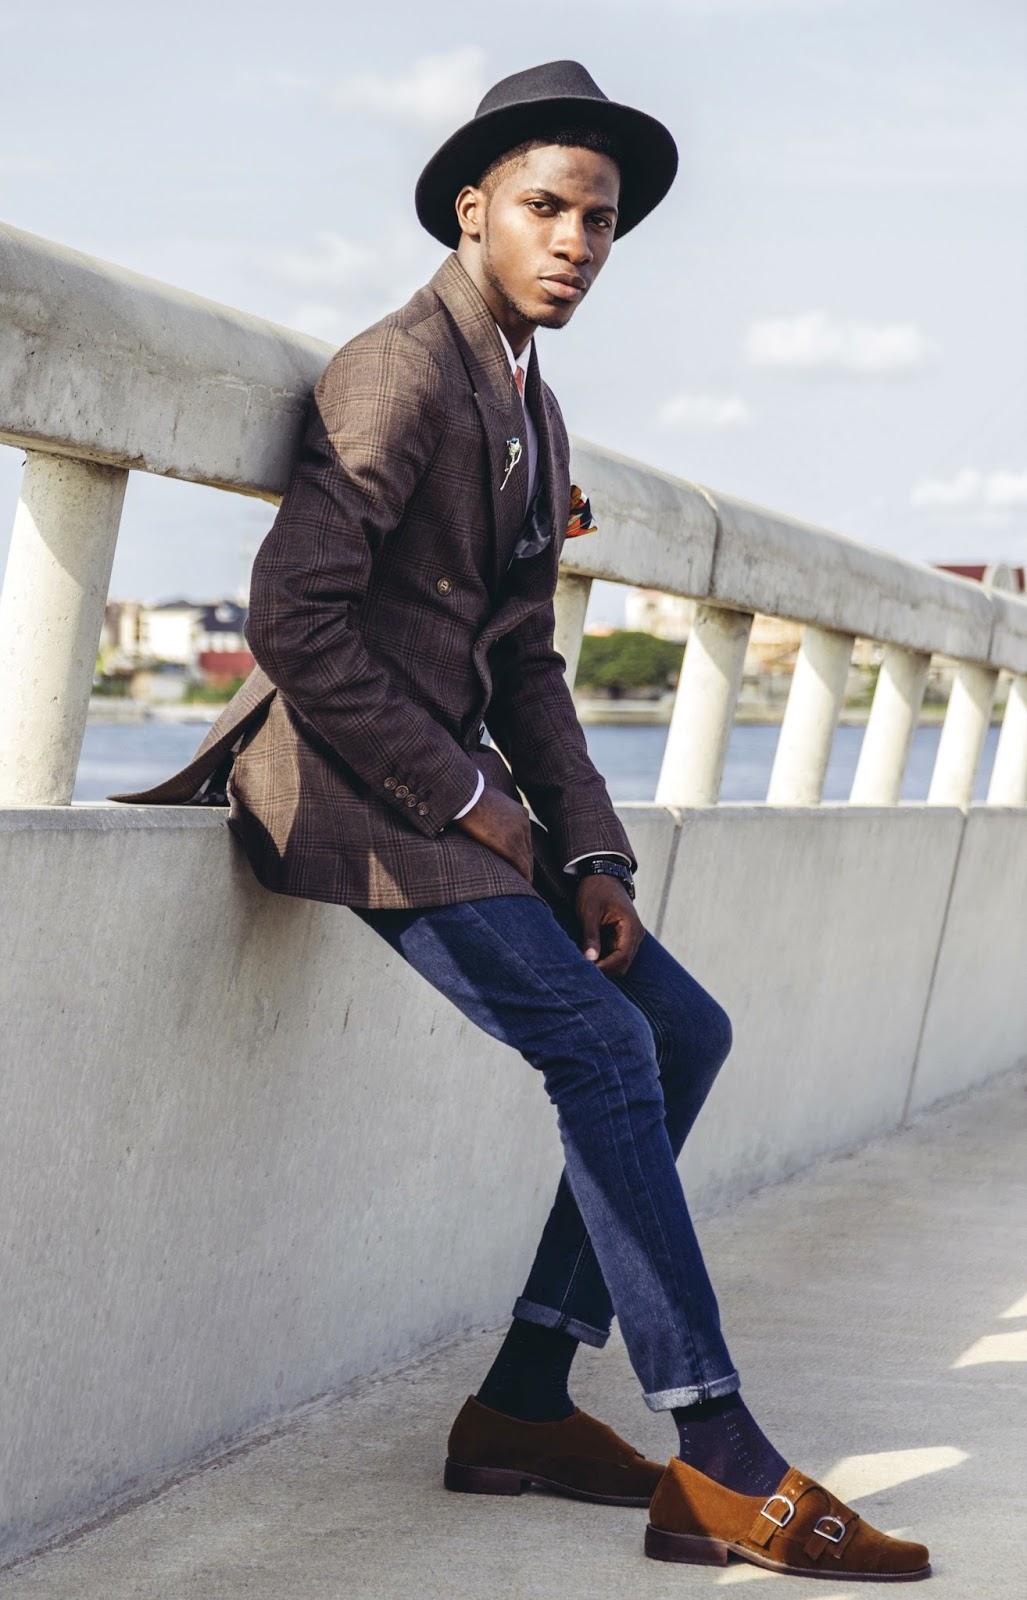 My Top 10 Nigerian Male Fashion Bloggers (Based In Nigeria